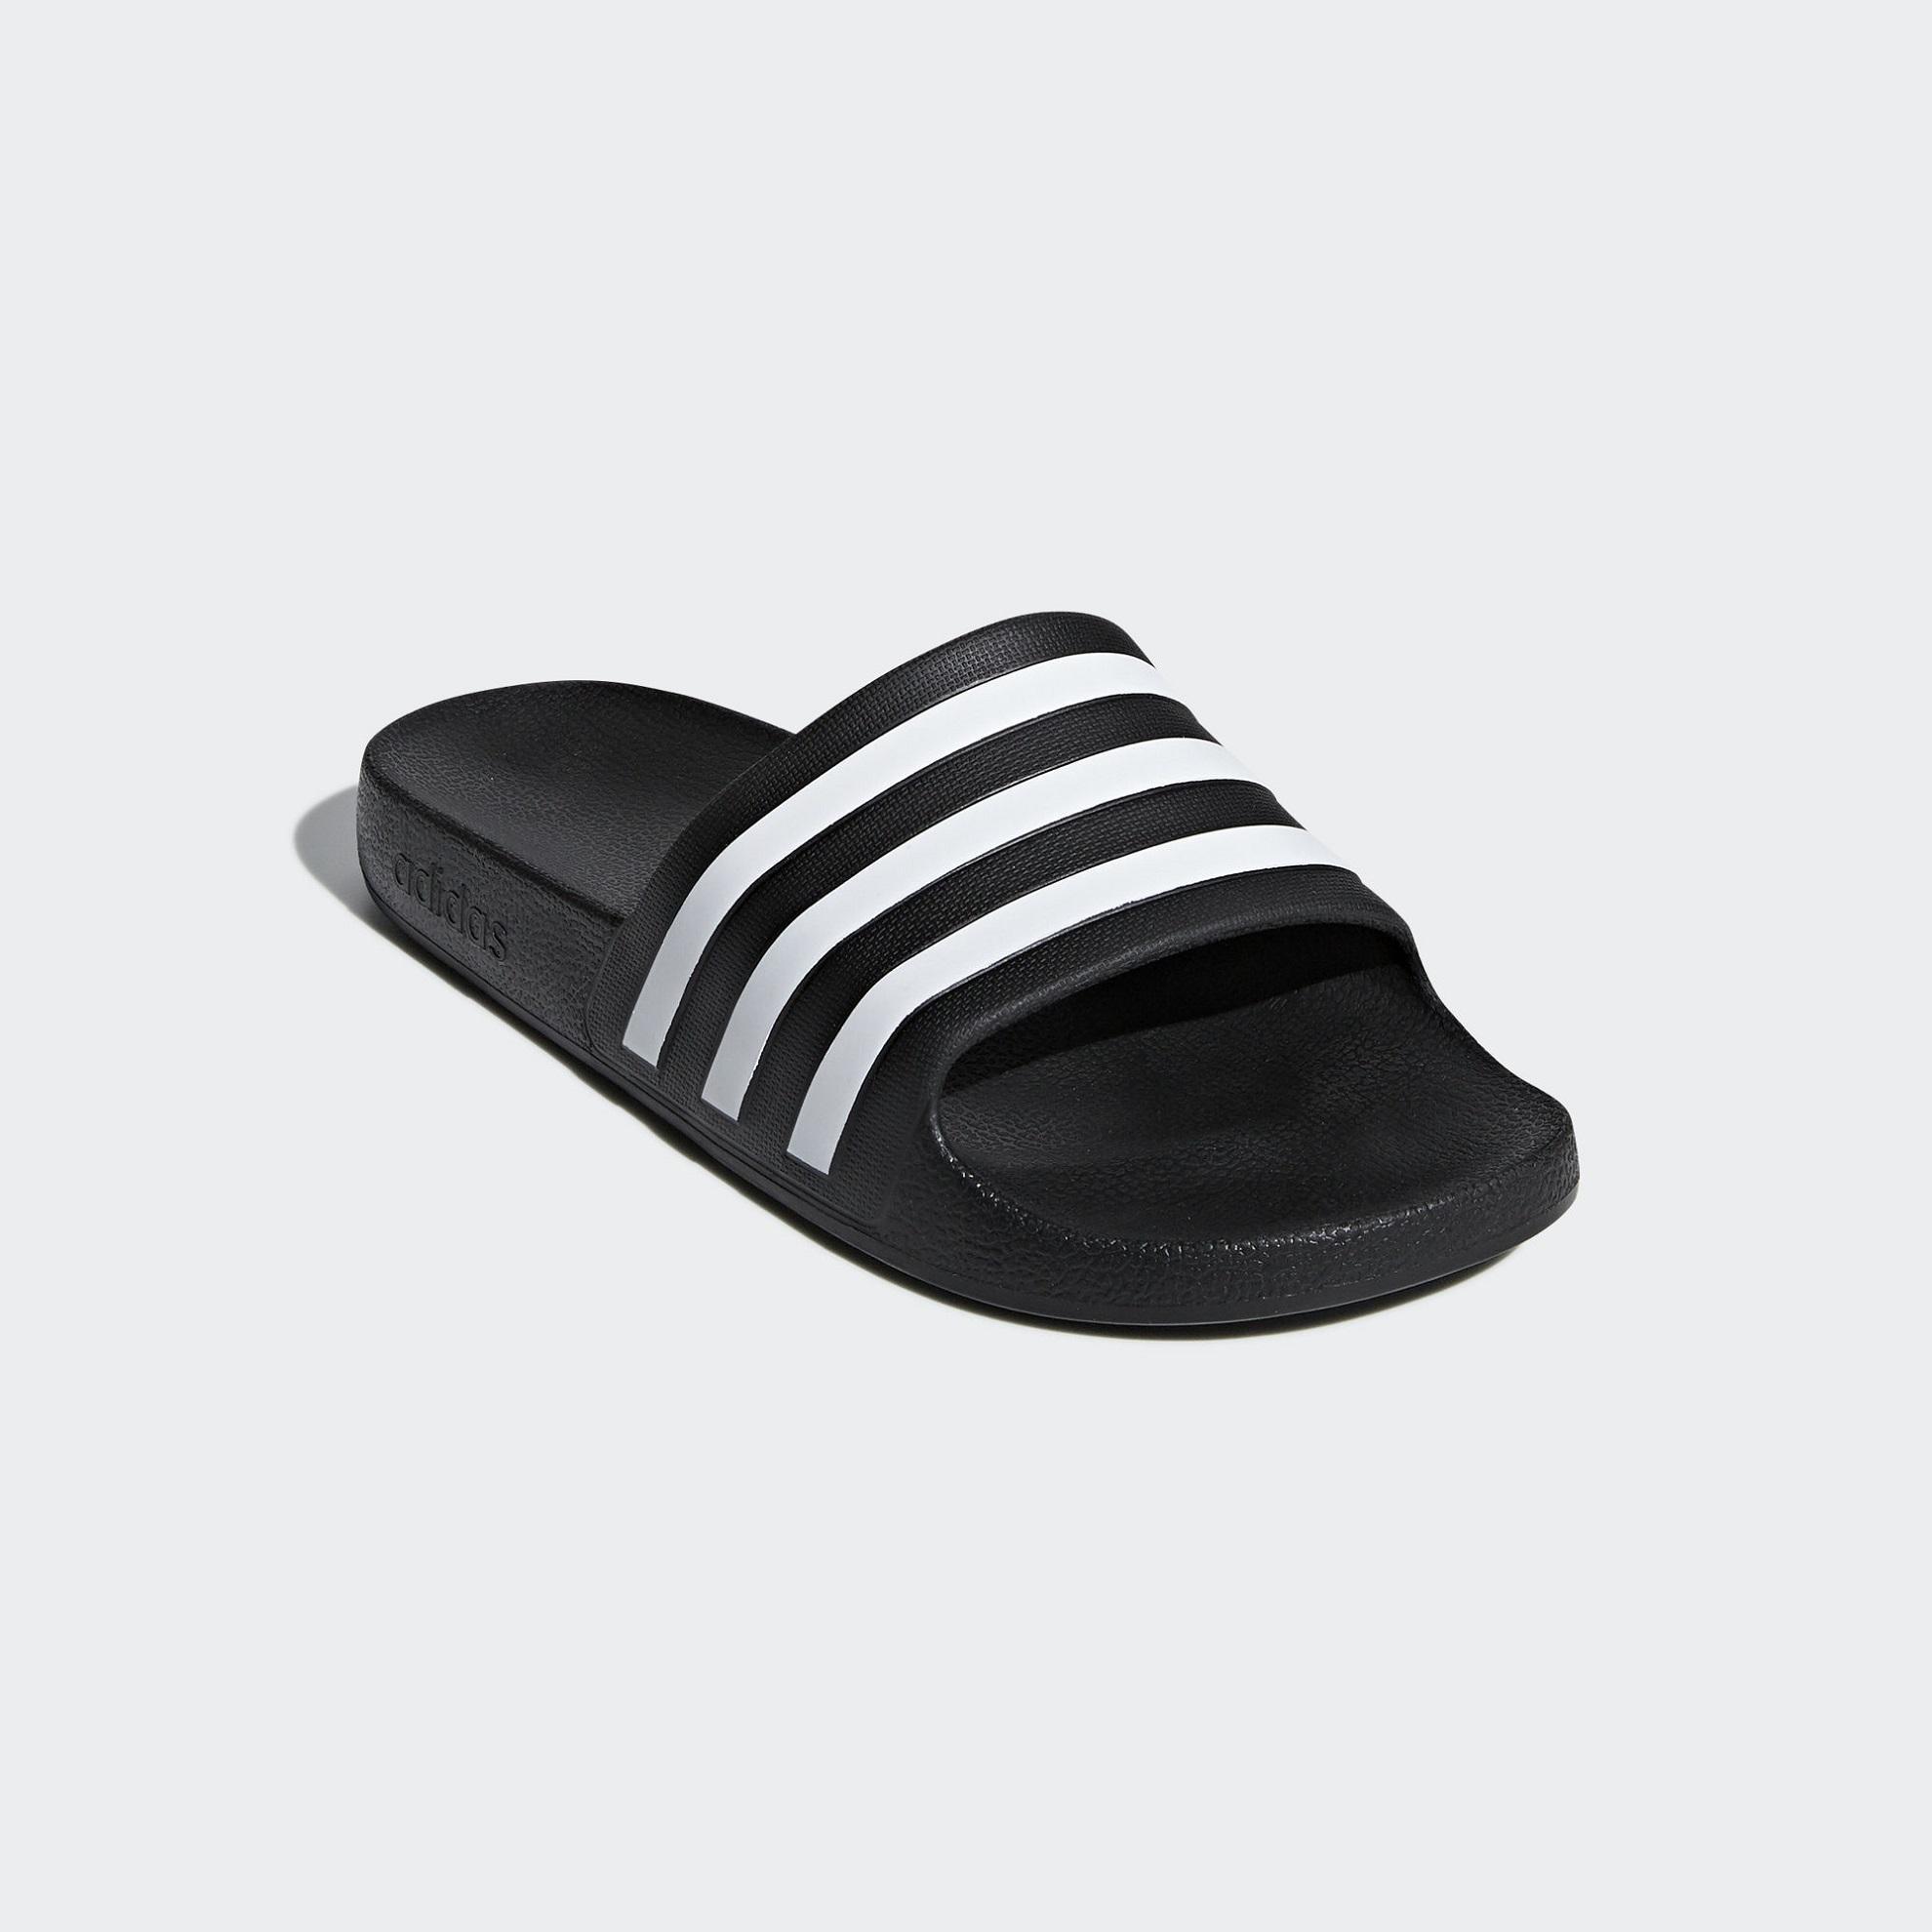 aae9d5ce3 Jual Sandal Olahraga Pria adidas Terbaru | Lazada.co.id